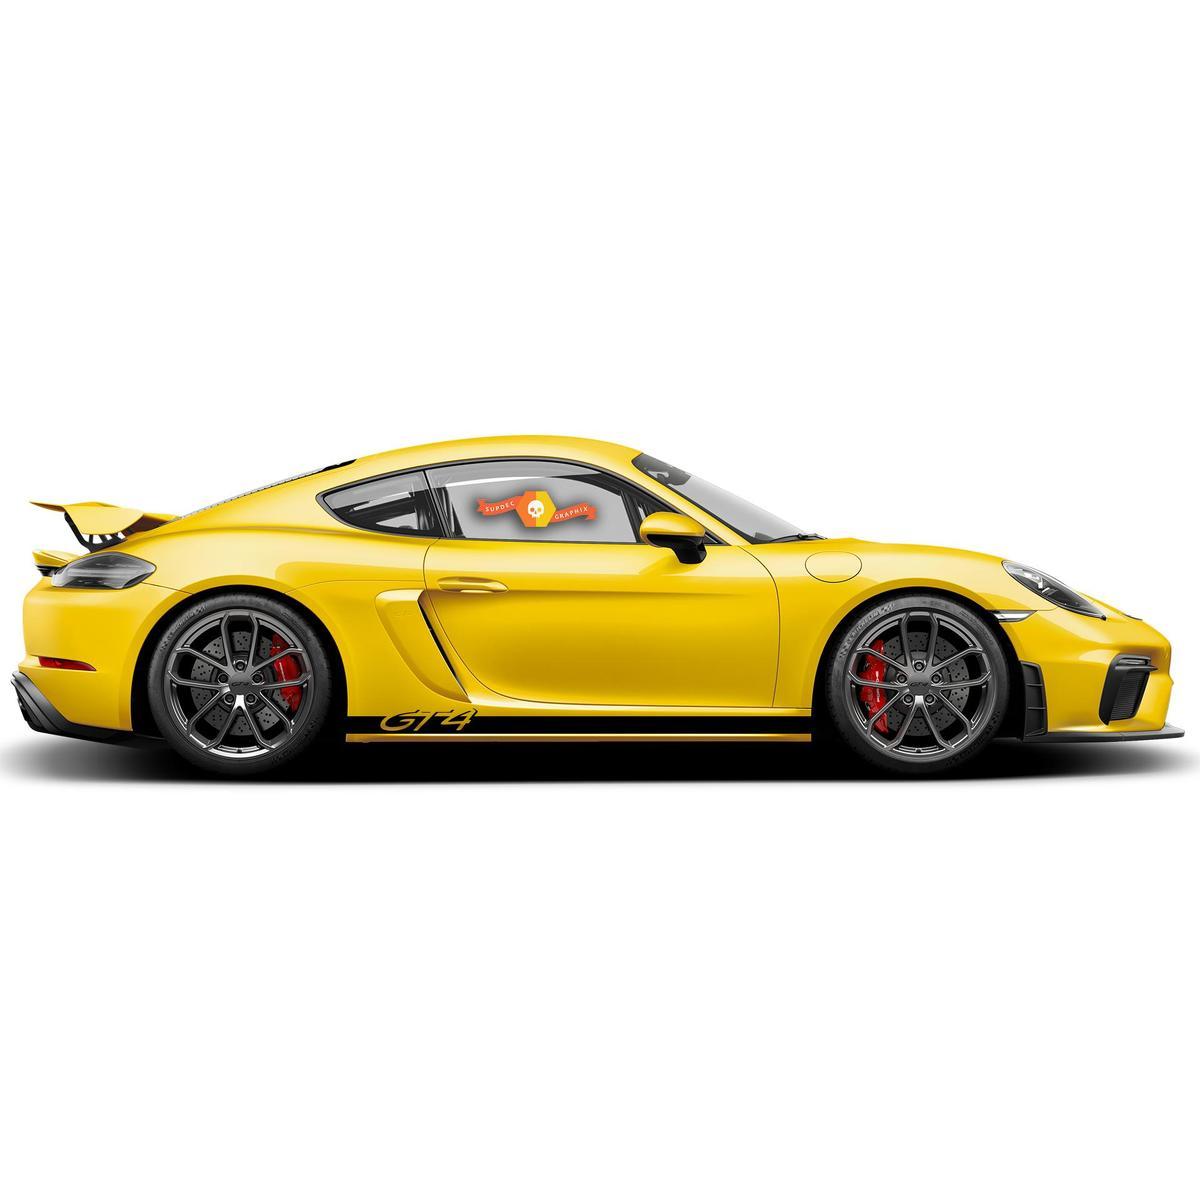 Porsche GT4 Side Stripes Kit Decal Sticker